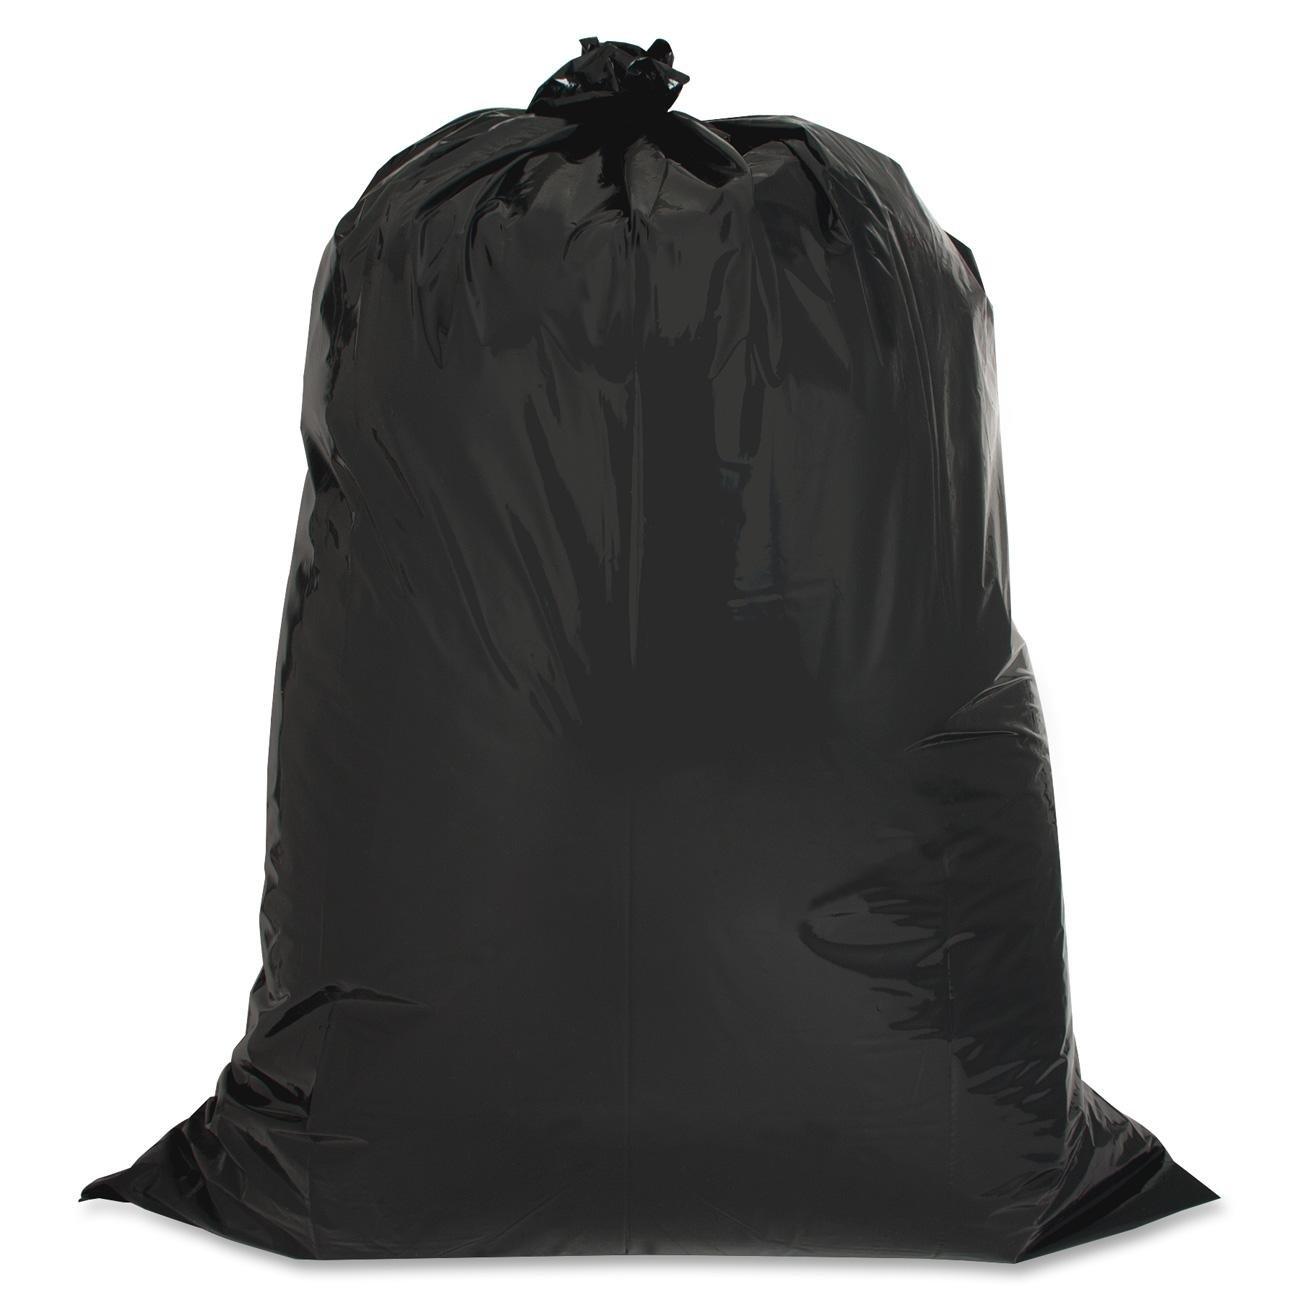 Trash Bag Open Trash Bag 42 Gallon